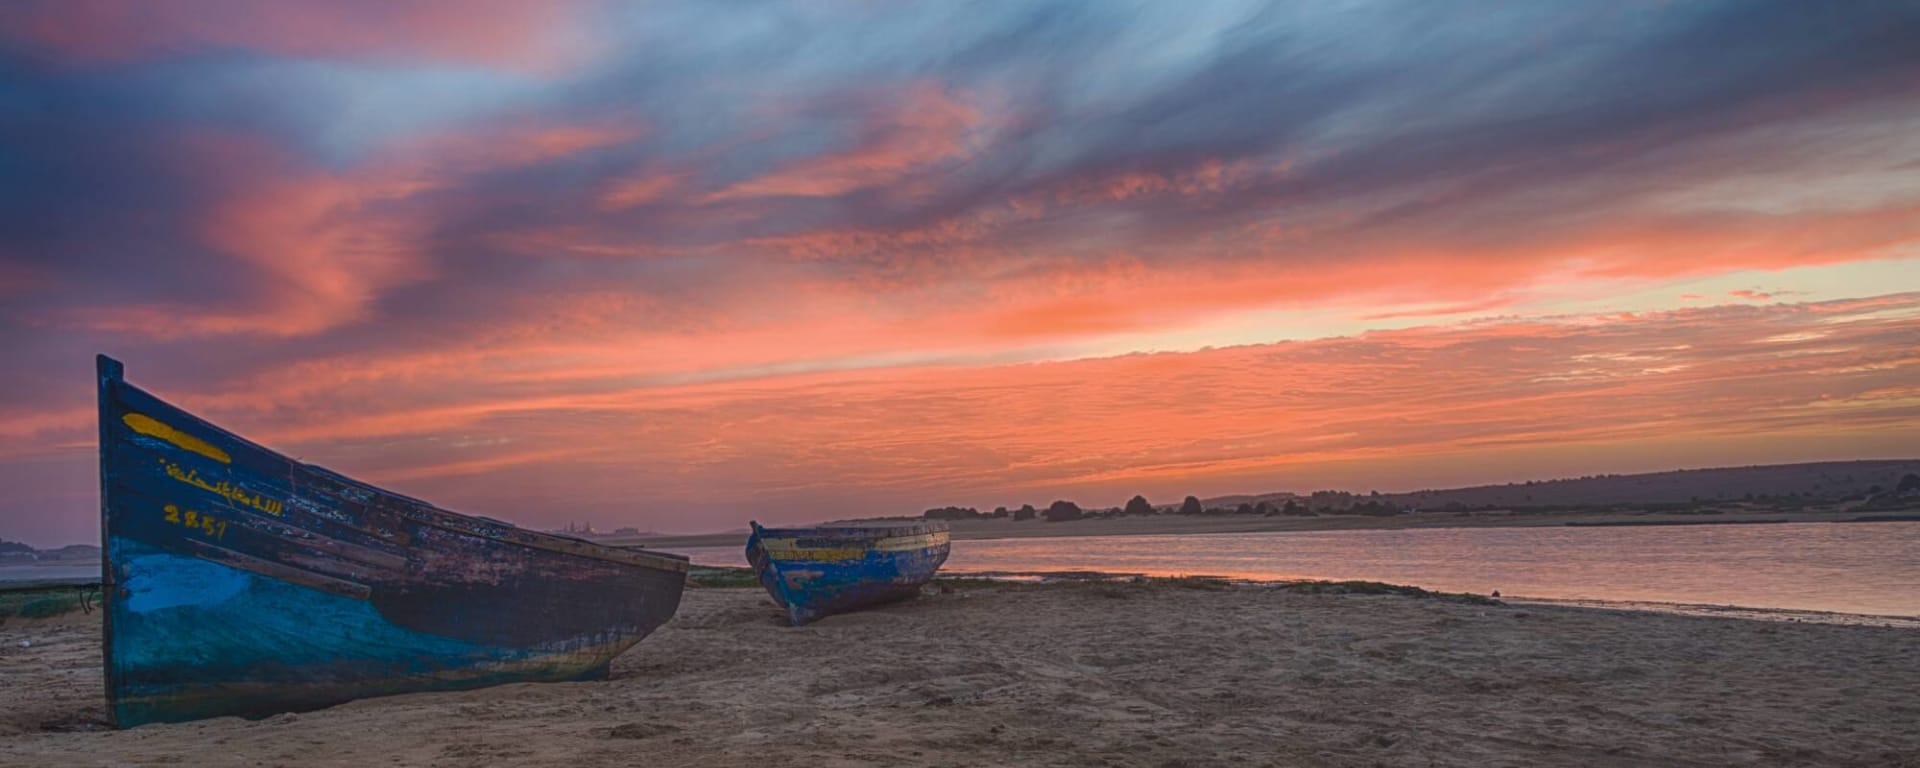 Marokko entdecken mit Tischler Reisen: Marokko Oualidia Strand Sonnenuntergang